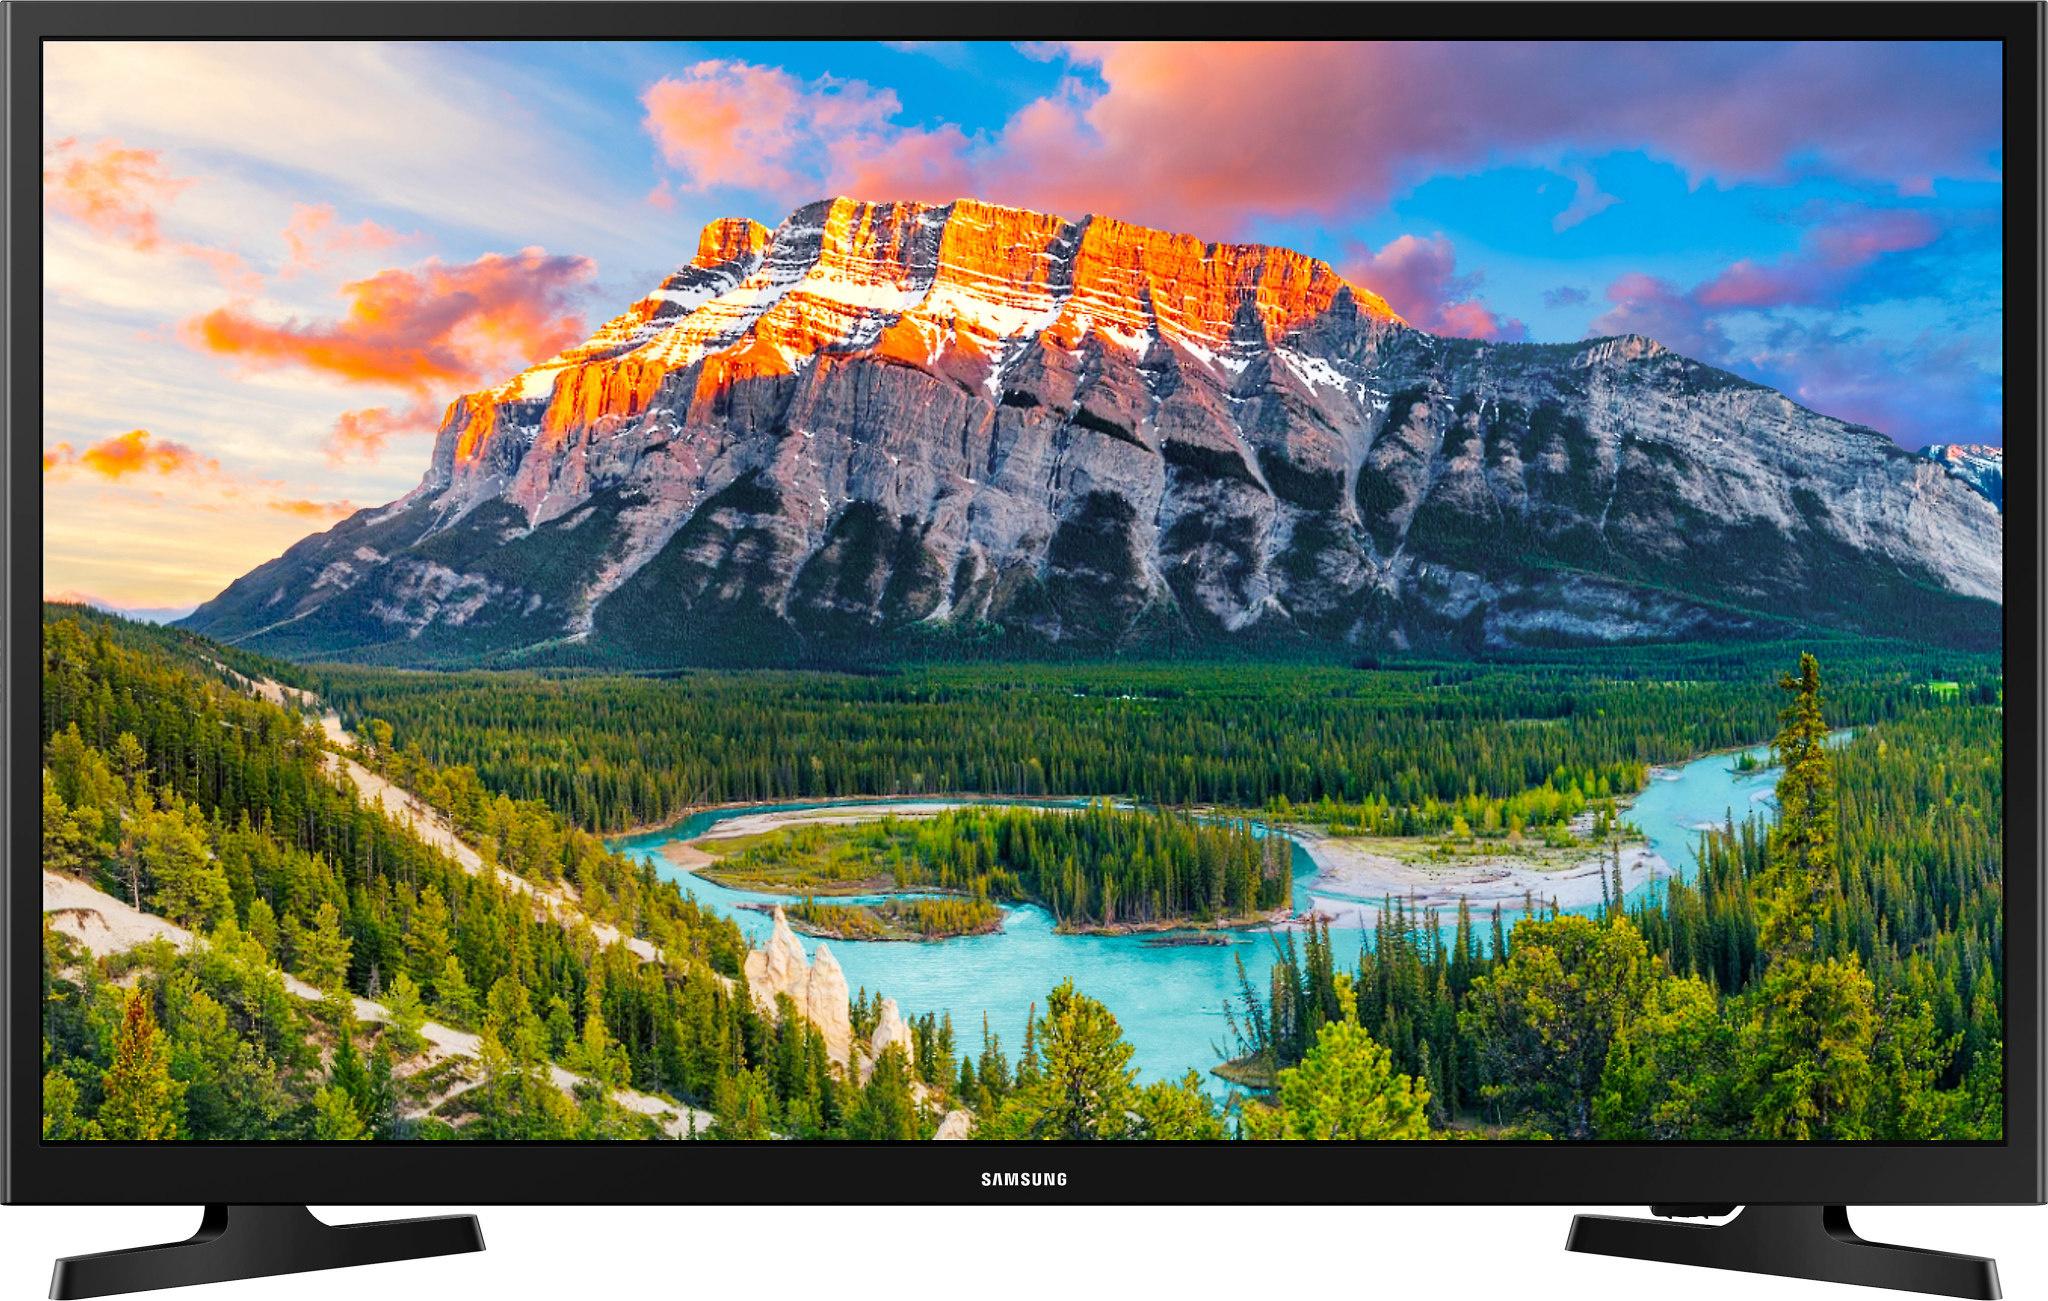 "Samsung Samsung 32"" UN32N5300 1080p HD Smart TV"